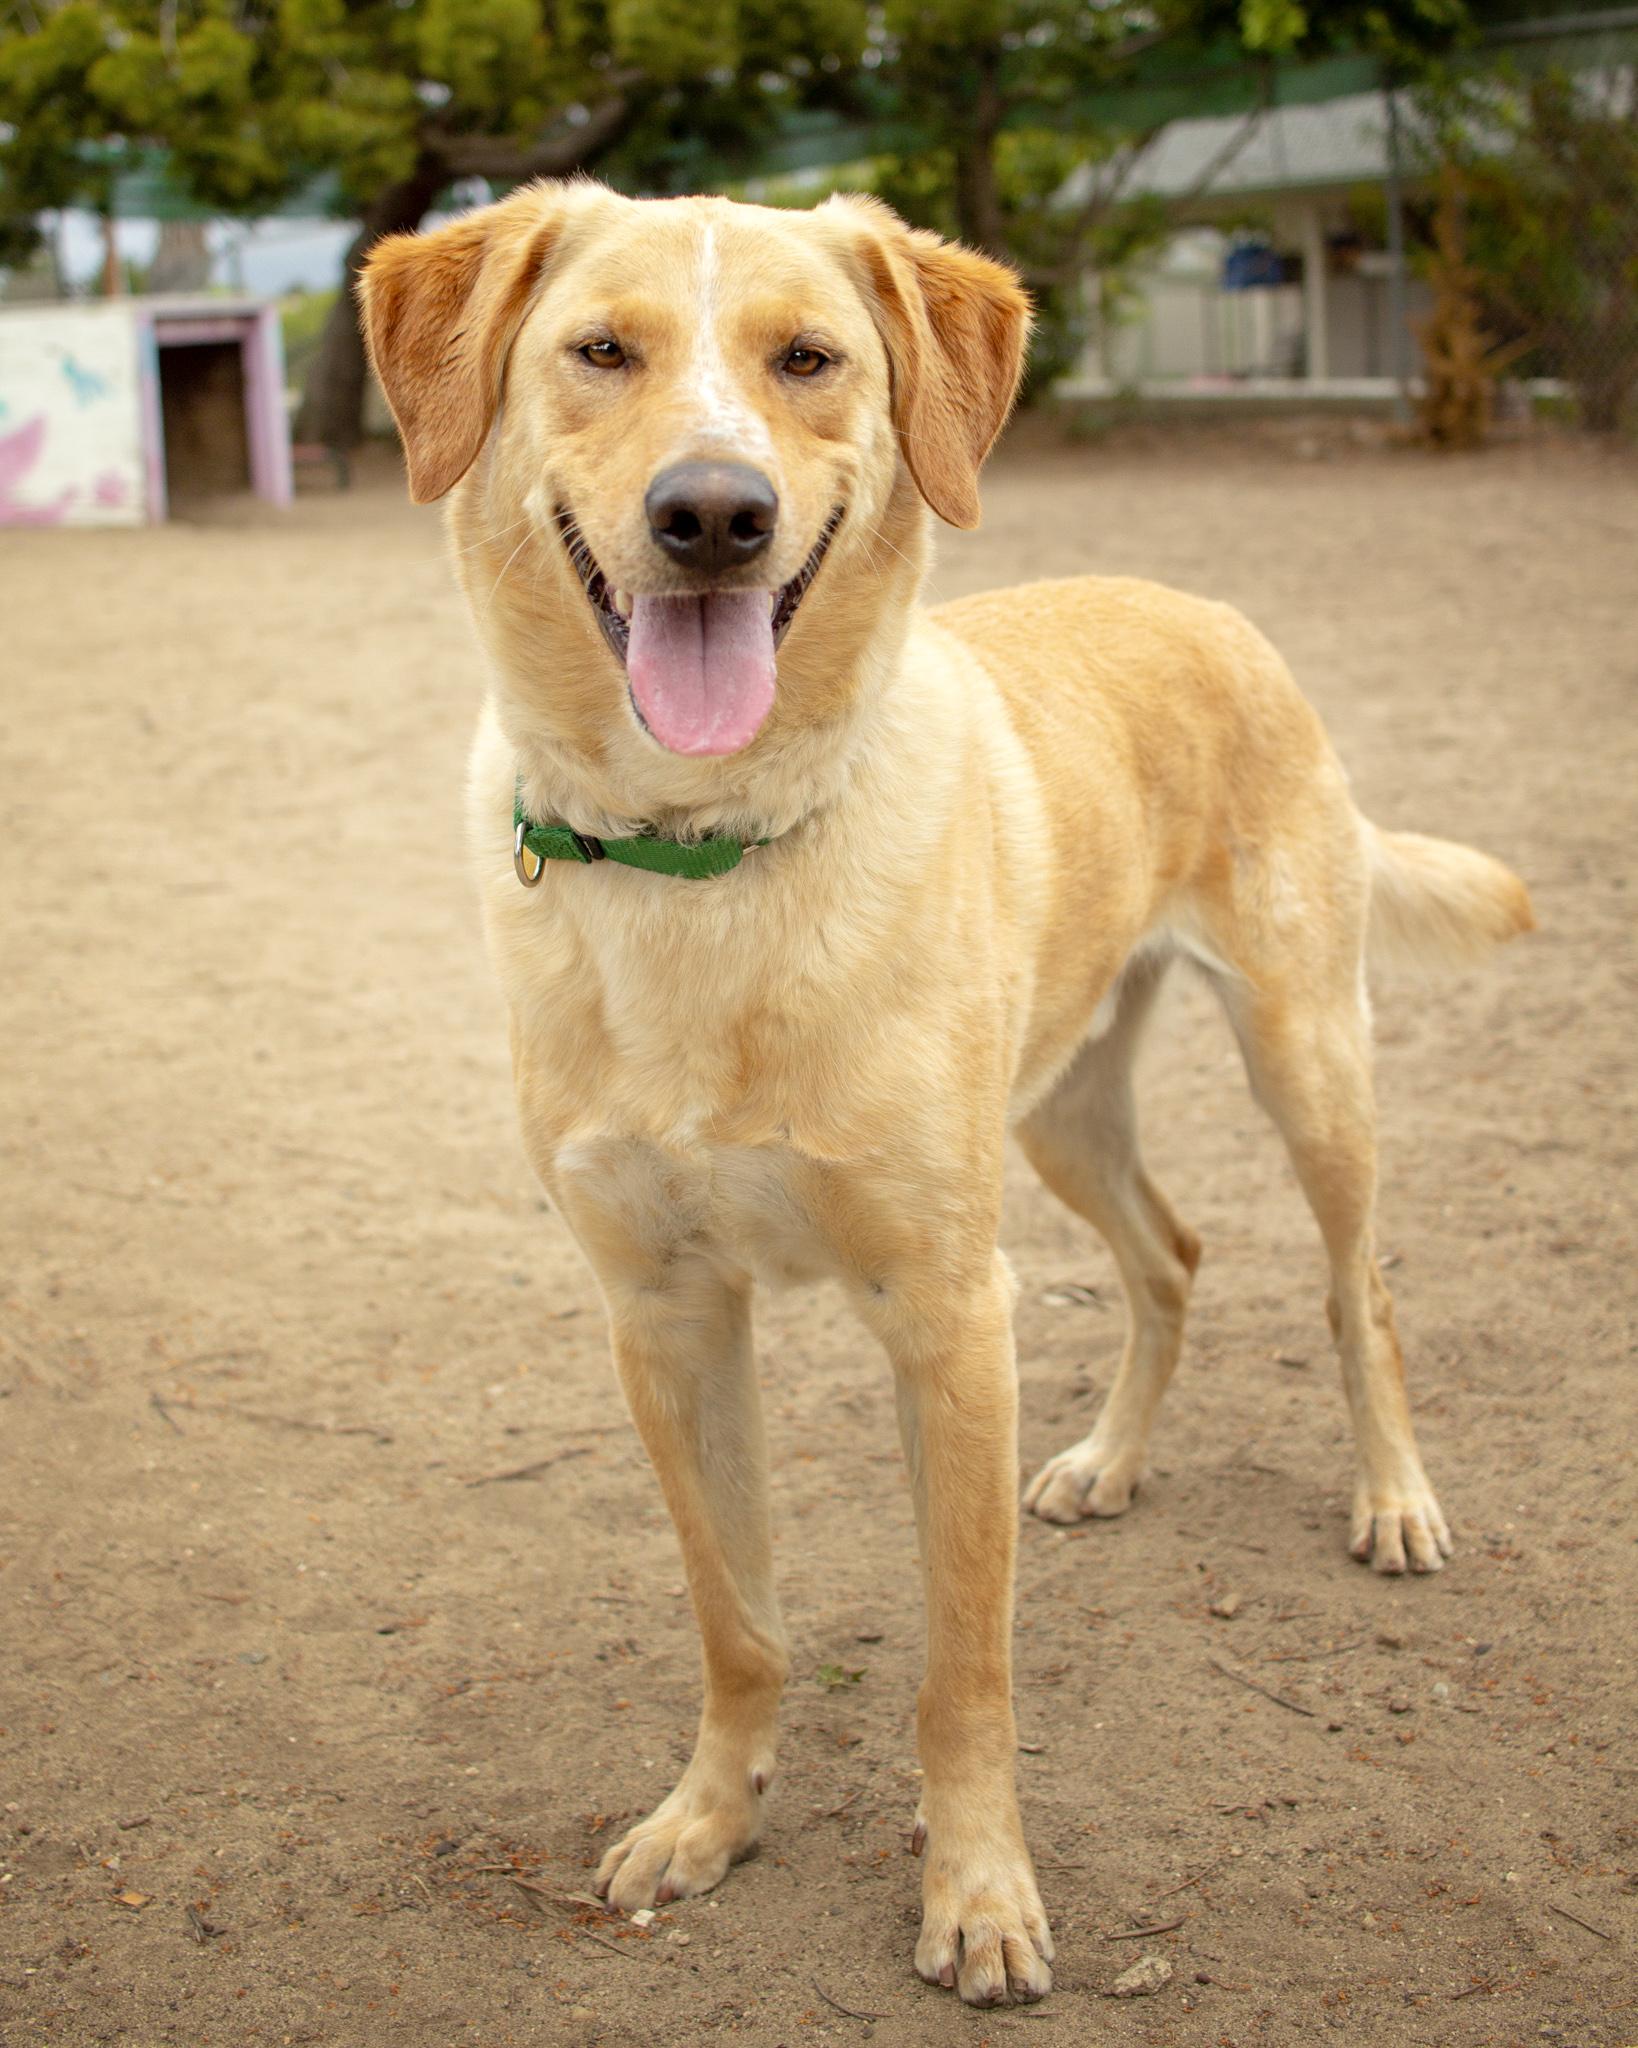 394-Orange-County-Dog-Photography-Steamer-Lee-Southern-California-SBACC.JPG